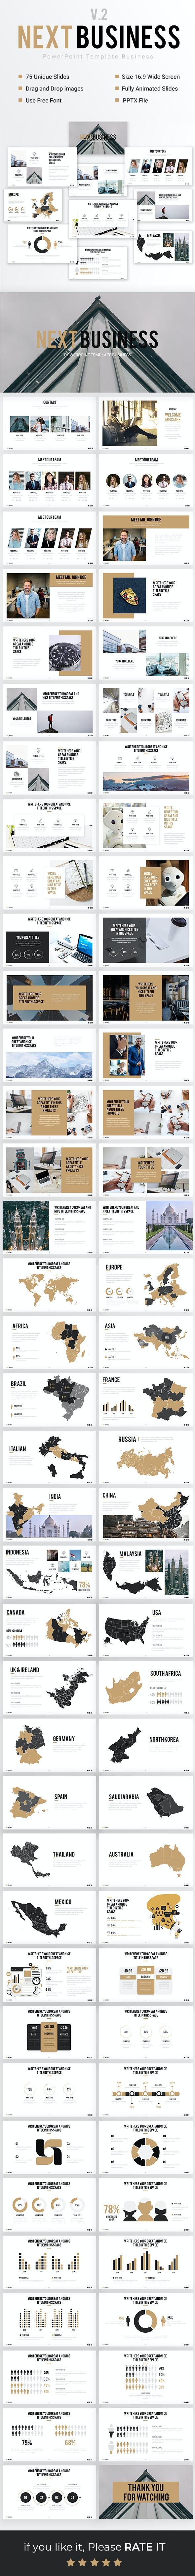 Next Business - Powerpoint Template Business - PowerPoint Templates Presentation Templates